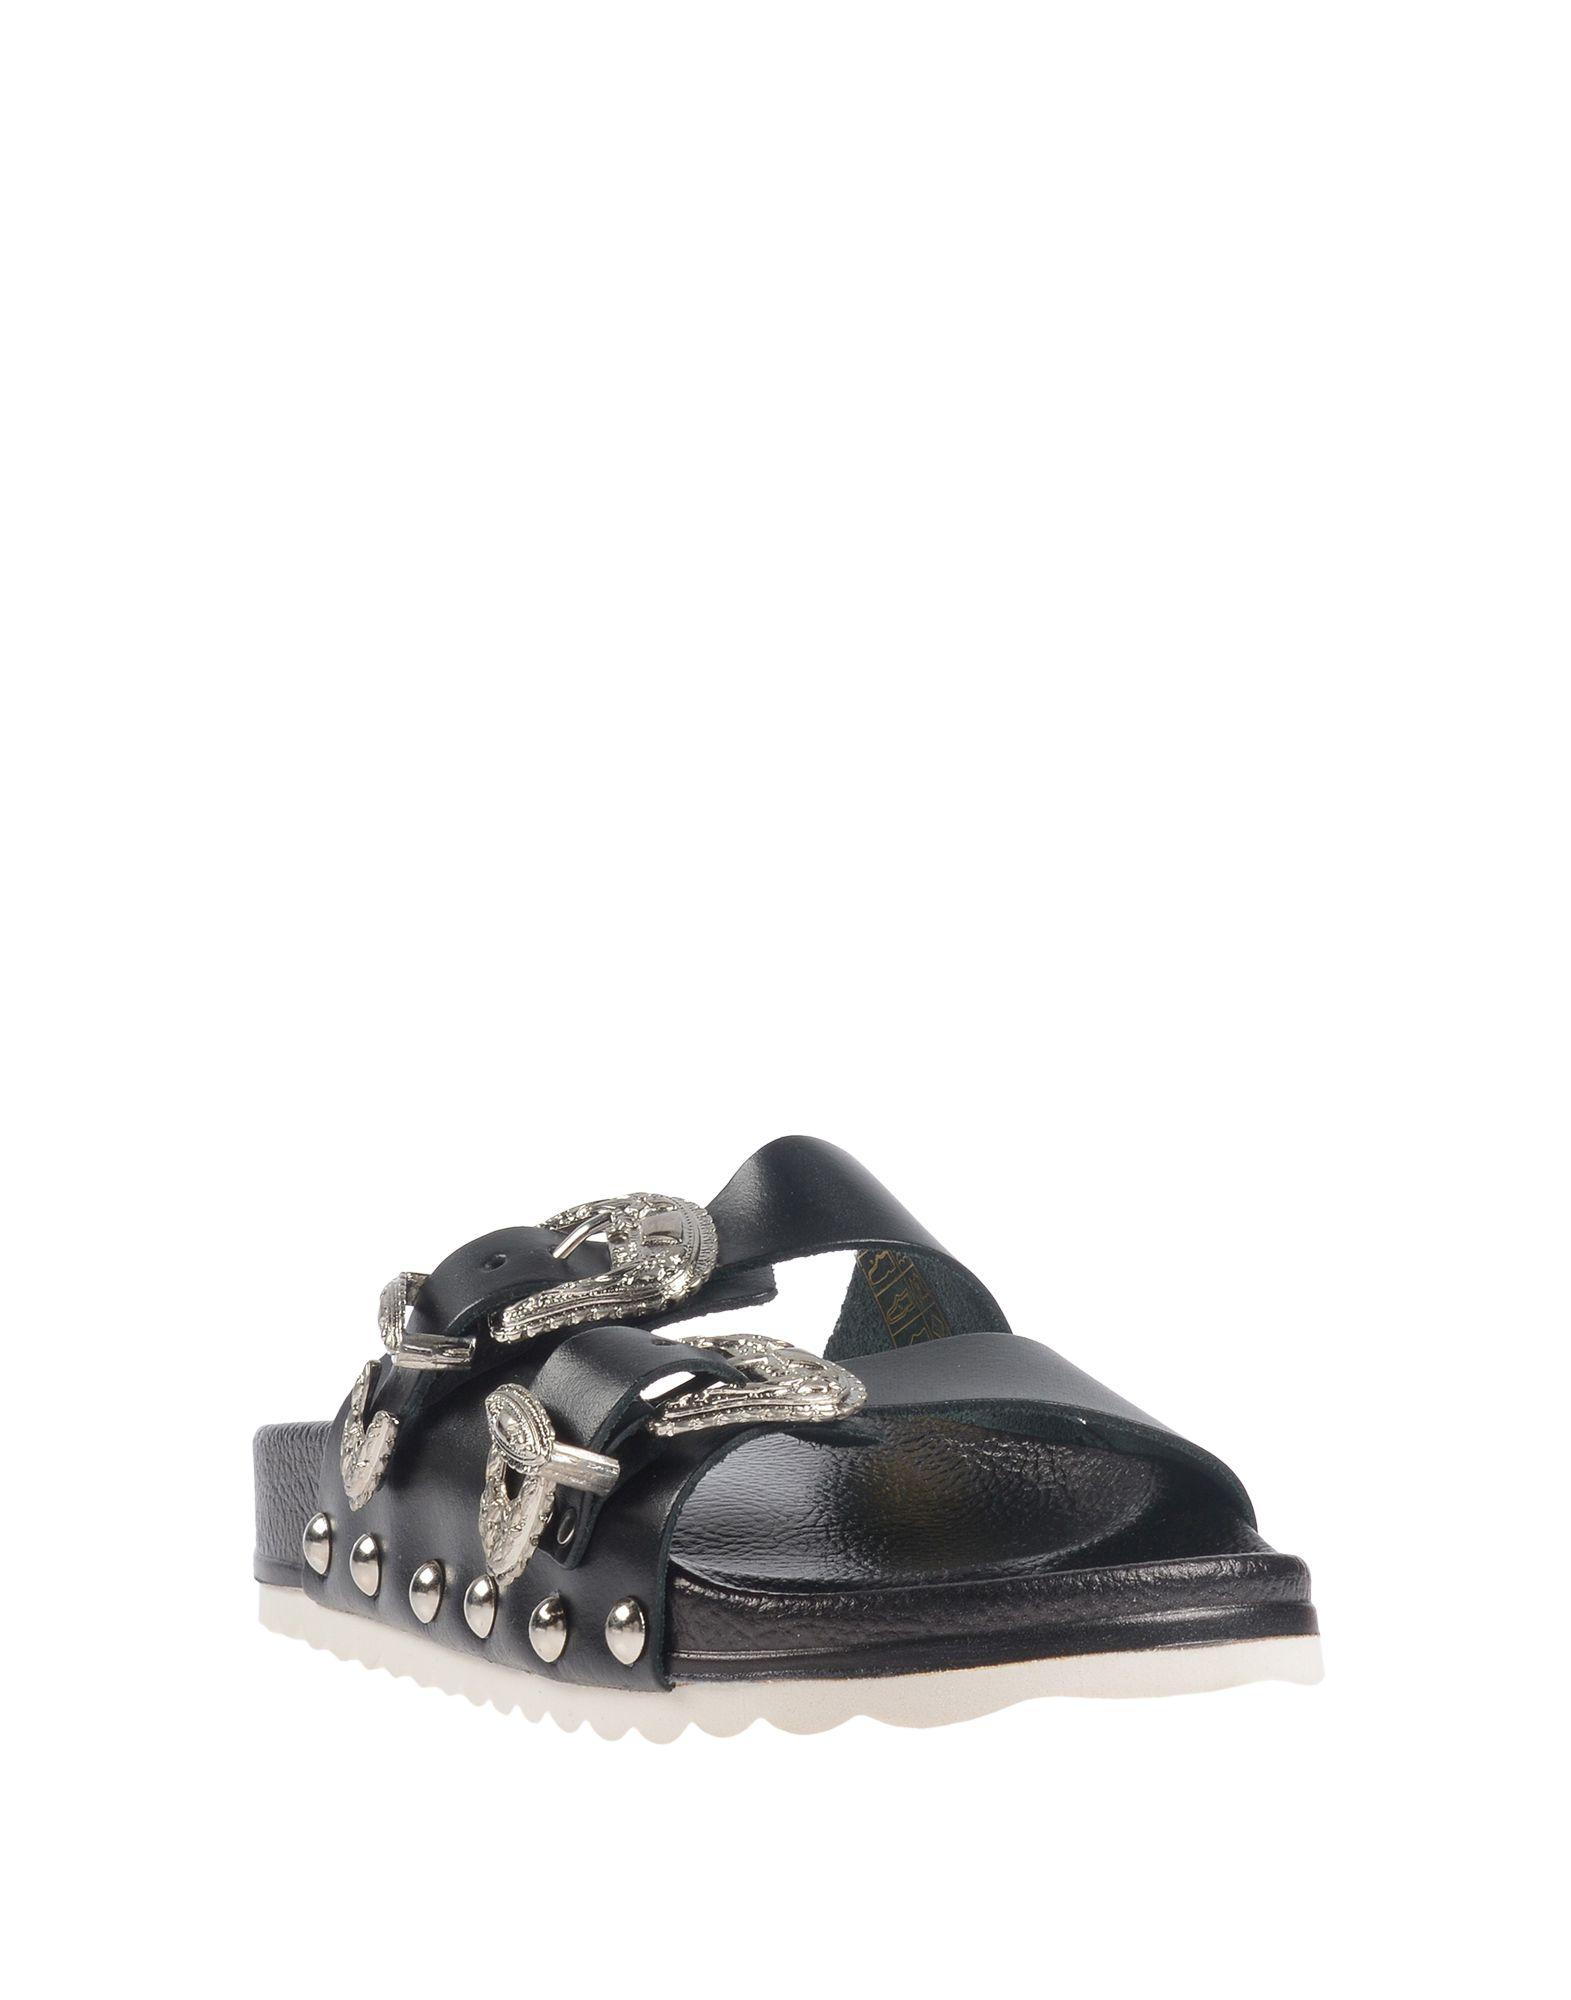 Nila & Nila Sandalen Damen    11583137DE Gute Qualität beliebte Schuhe 95905f